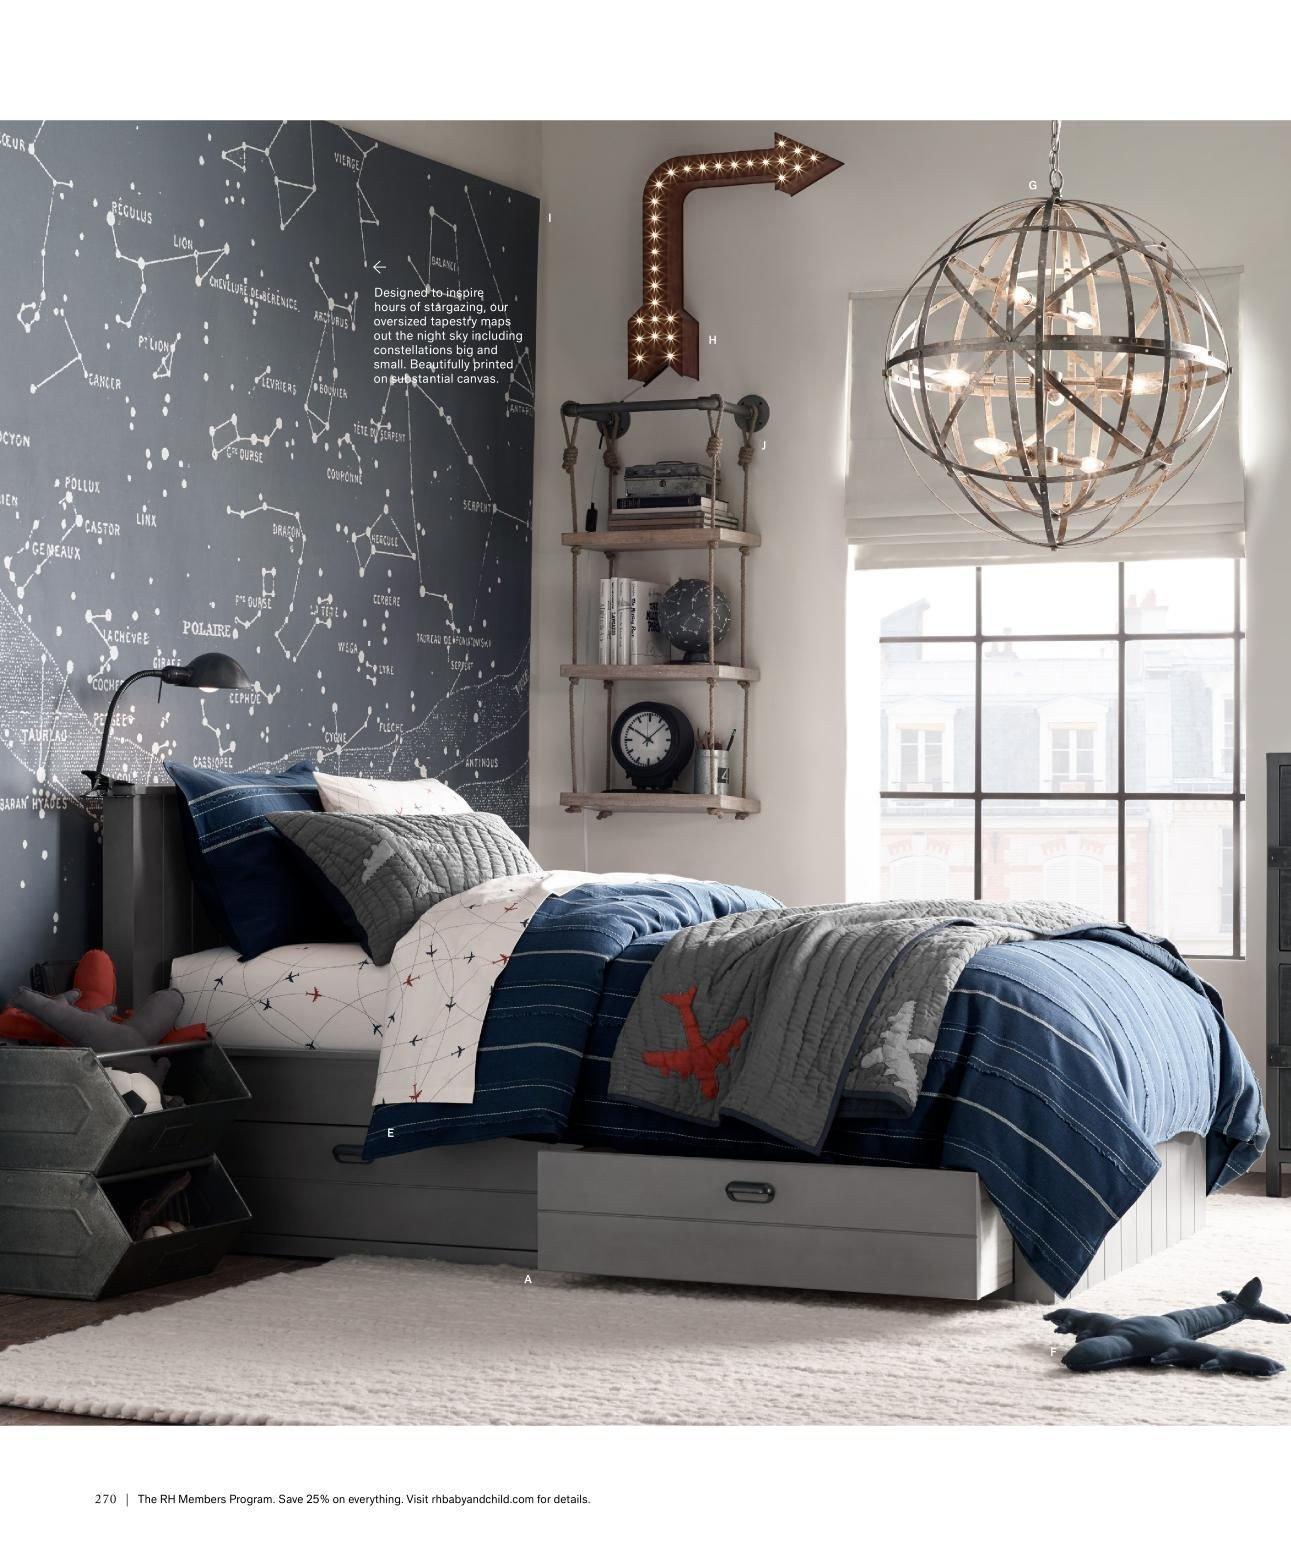 Cool Boy Bedroom Ideas Beautiful Rh Baby & Child source Books